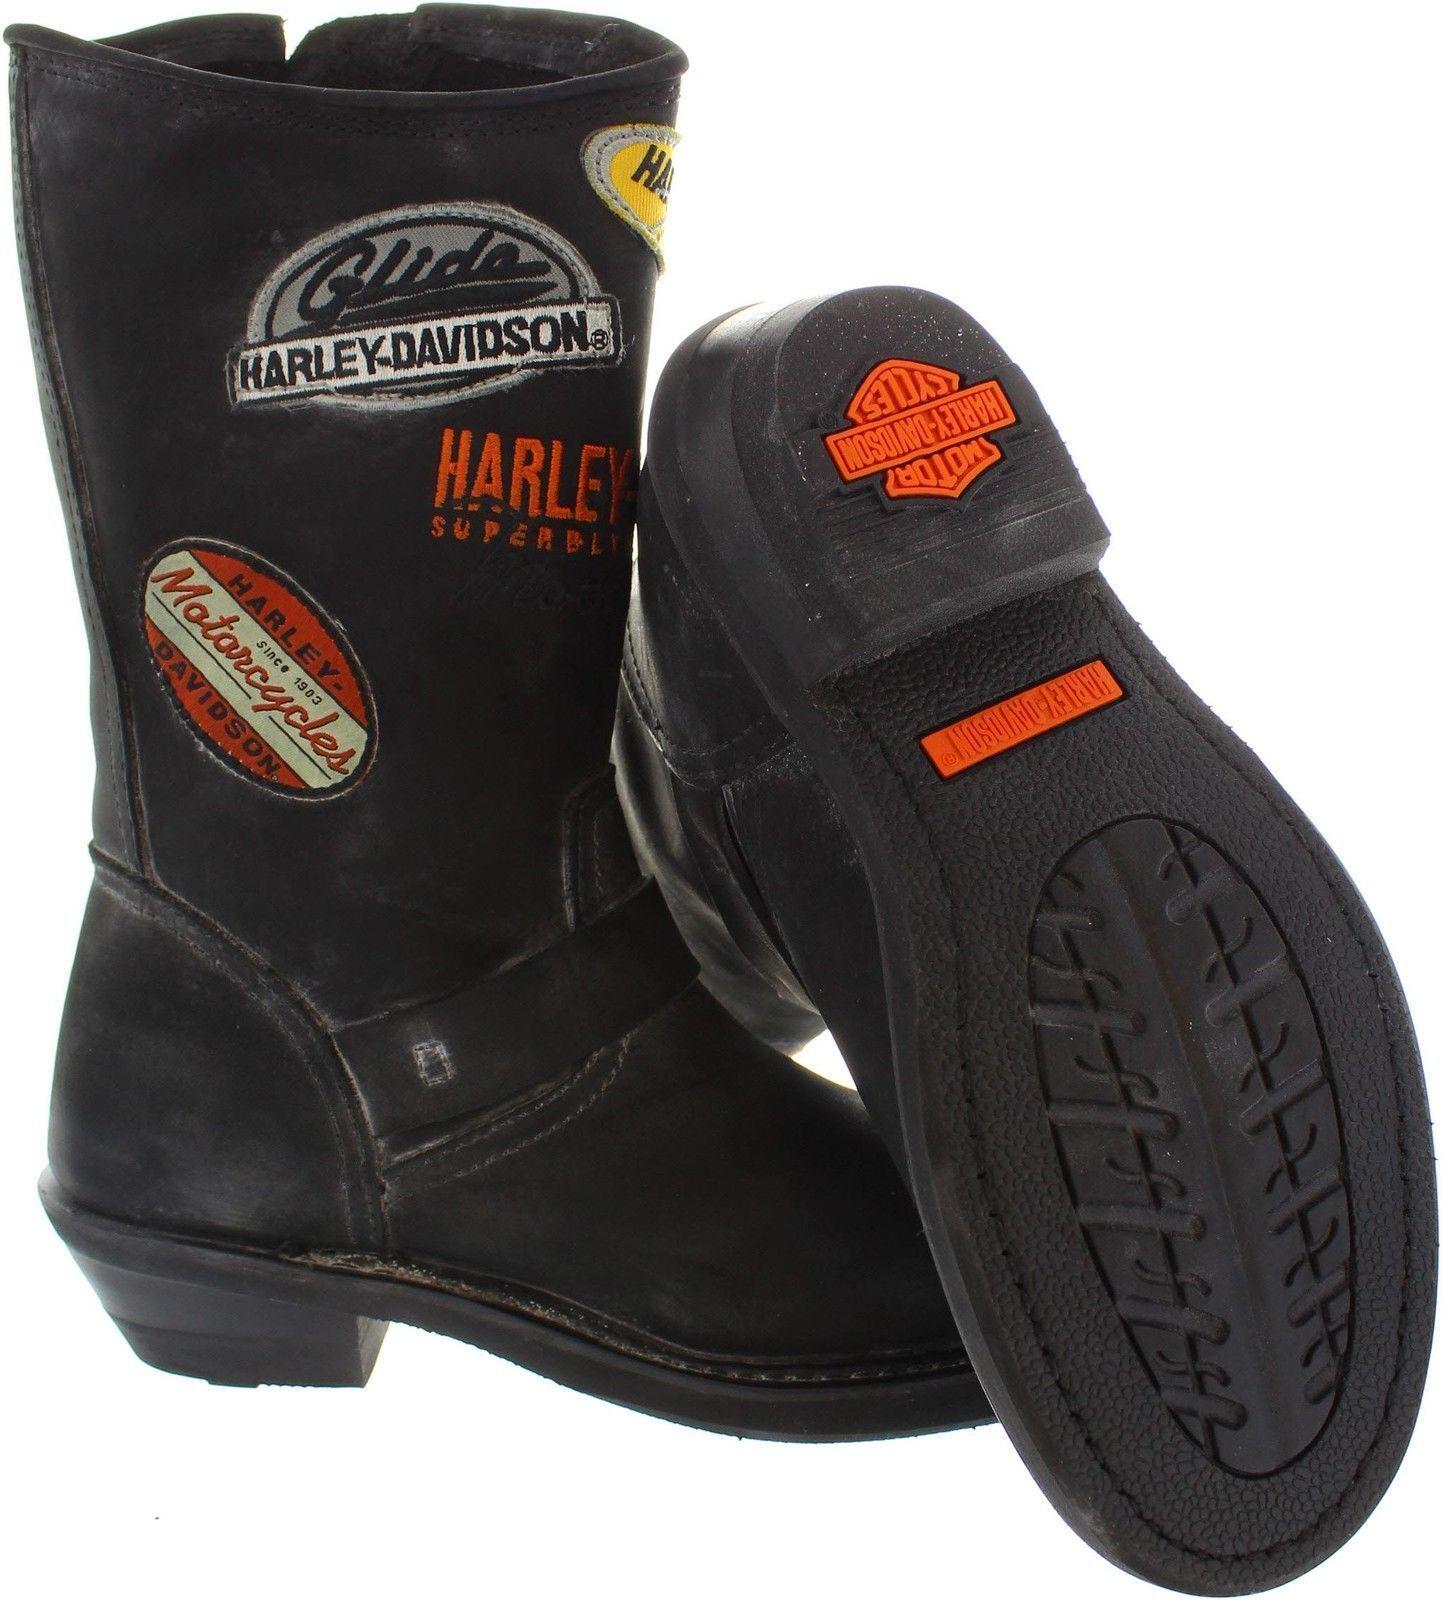 Damen Harley Schwarzes Davidson Brooklyn Patch Abgestaubt Schwarzes Harley Leder Biker Boots f94ed1